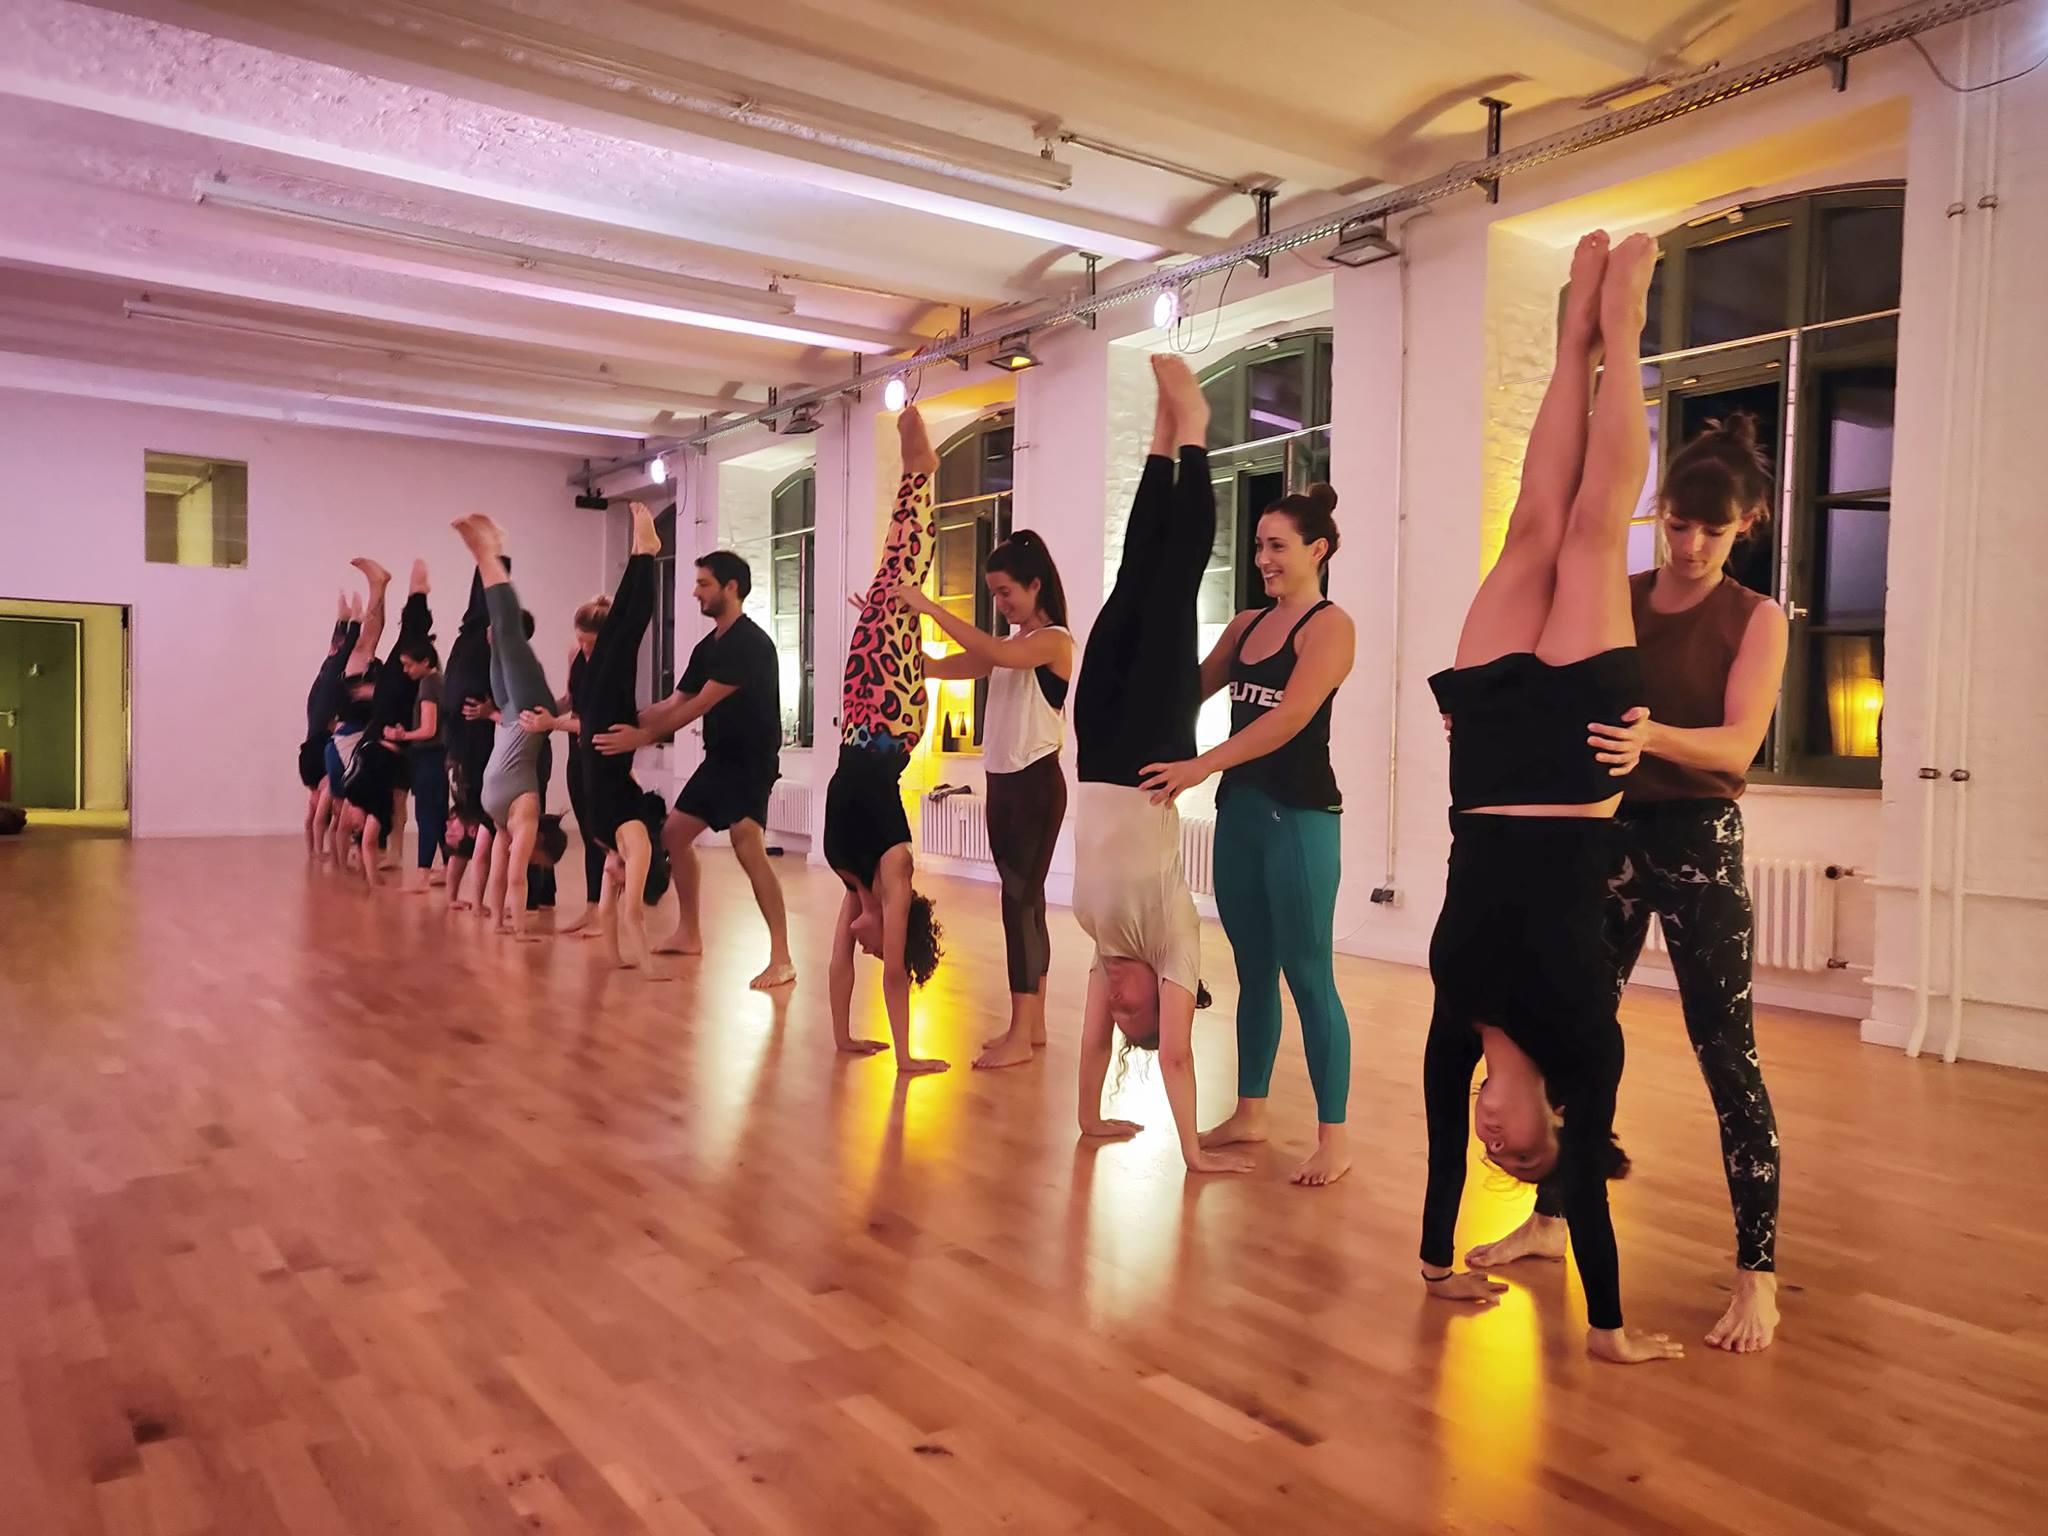 Handstand practice with partner at Inverted World studio Berlin